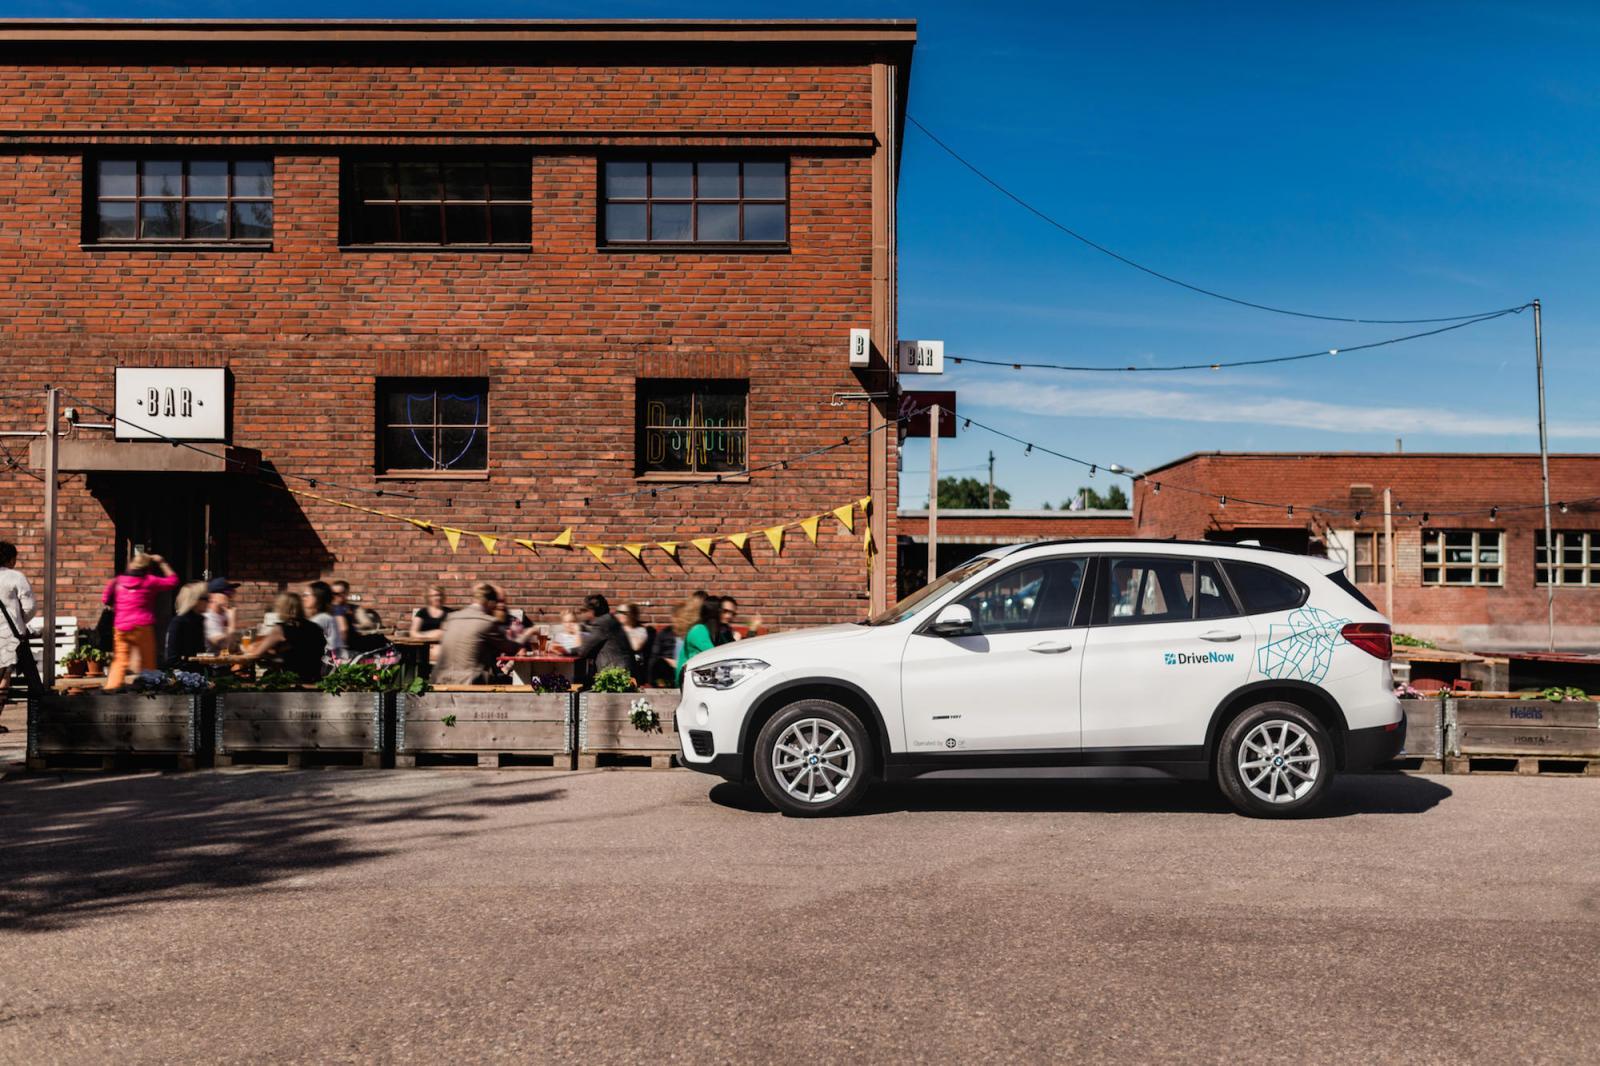 drivenow_helsinki_bmw_x1_parking_restaurant_tuntipaketitblogi